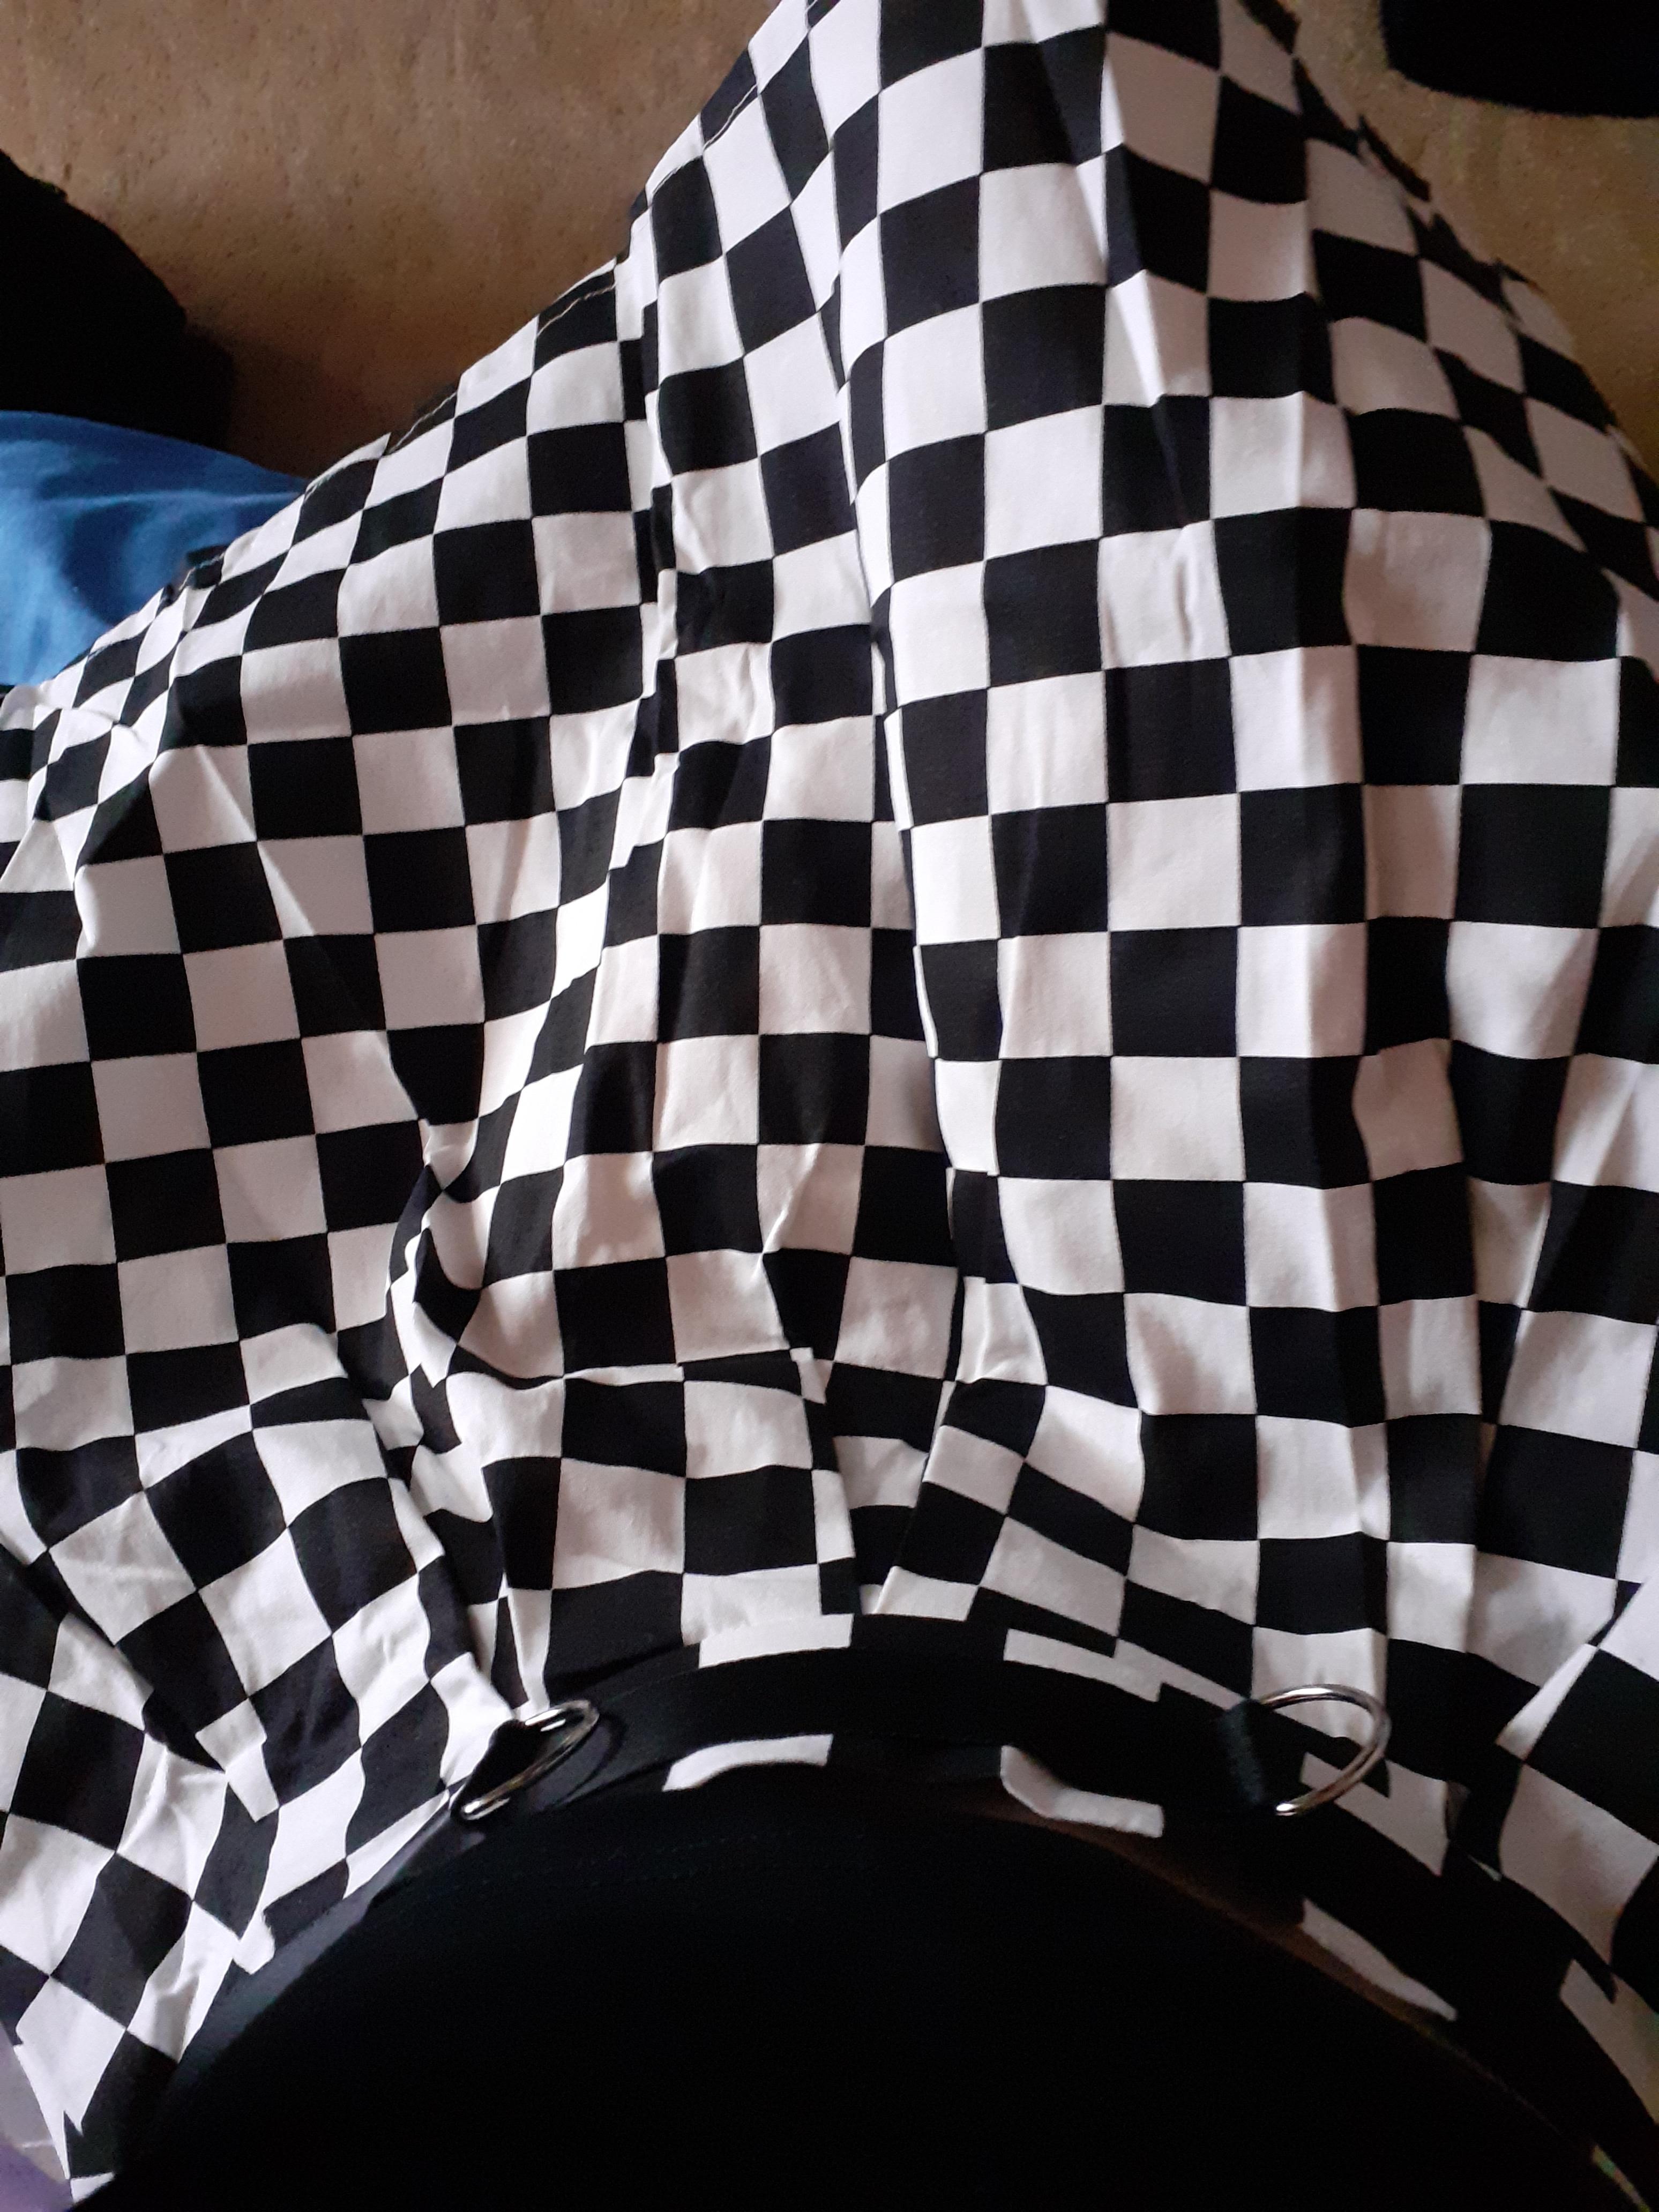 Checkered Harajuku Skirt E-girl photo review